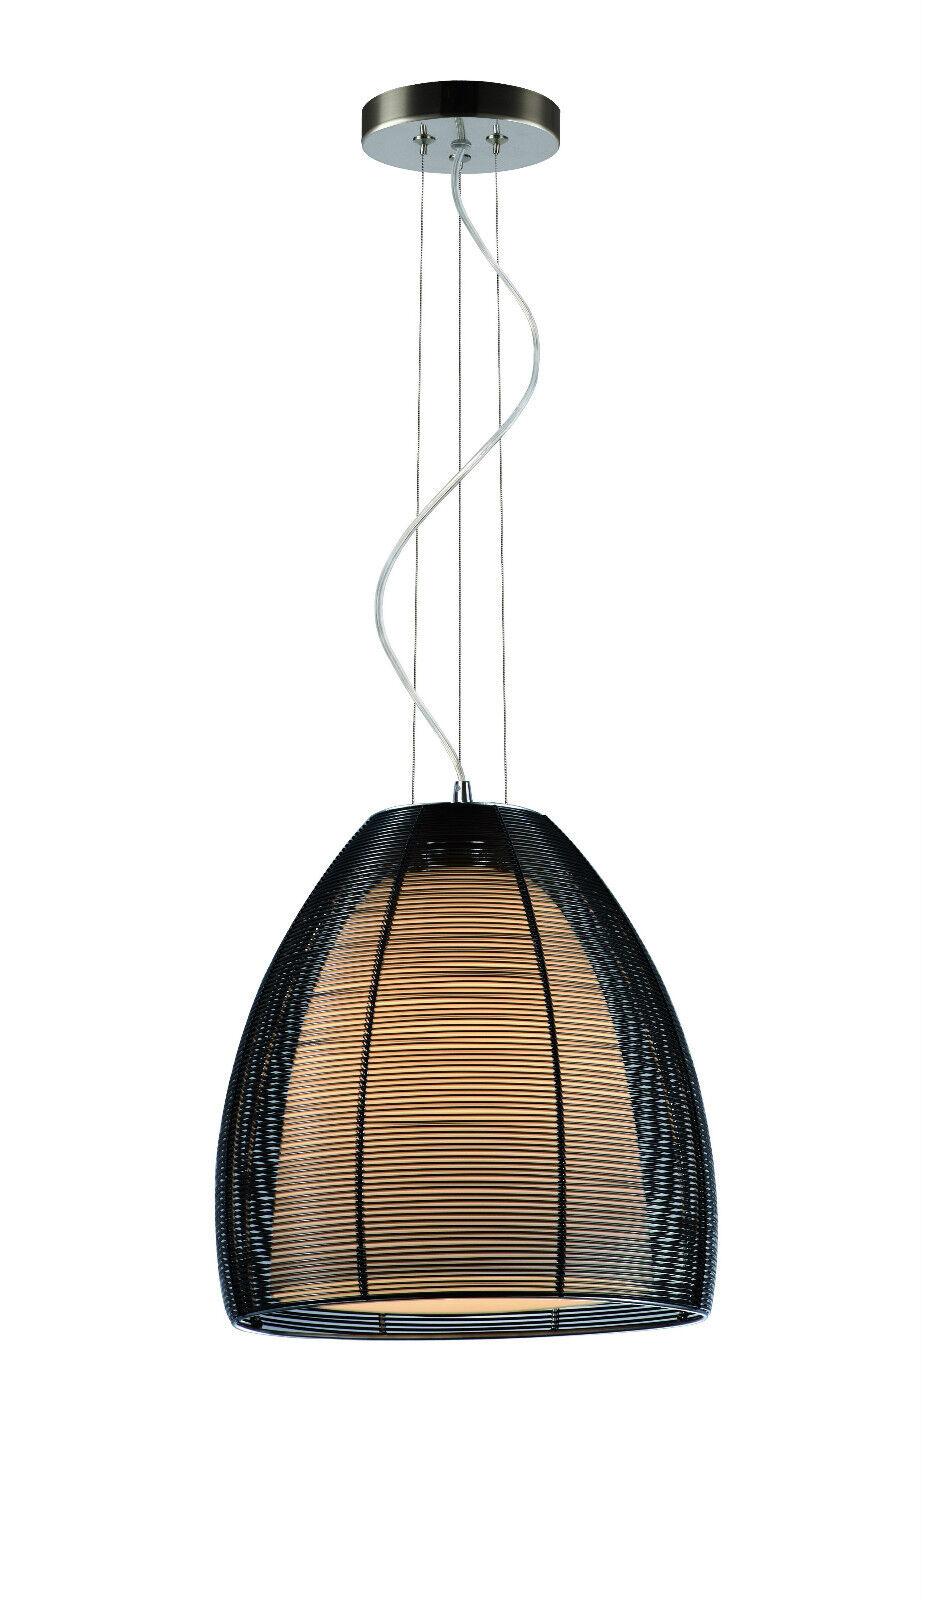 pendelleuchte drop lighting cluster drahtschirm innen opalglas inklusive led ebay. Black Bedroom Furniture Sets. Home Design Ideas